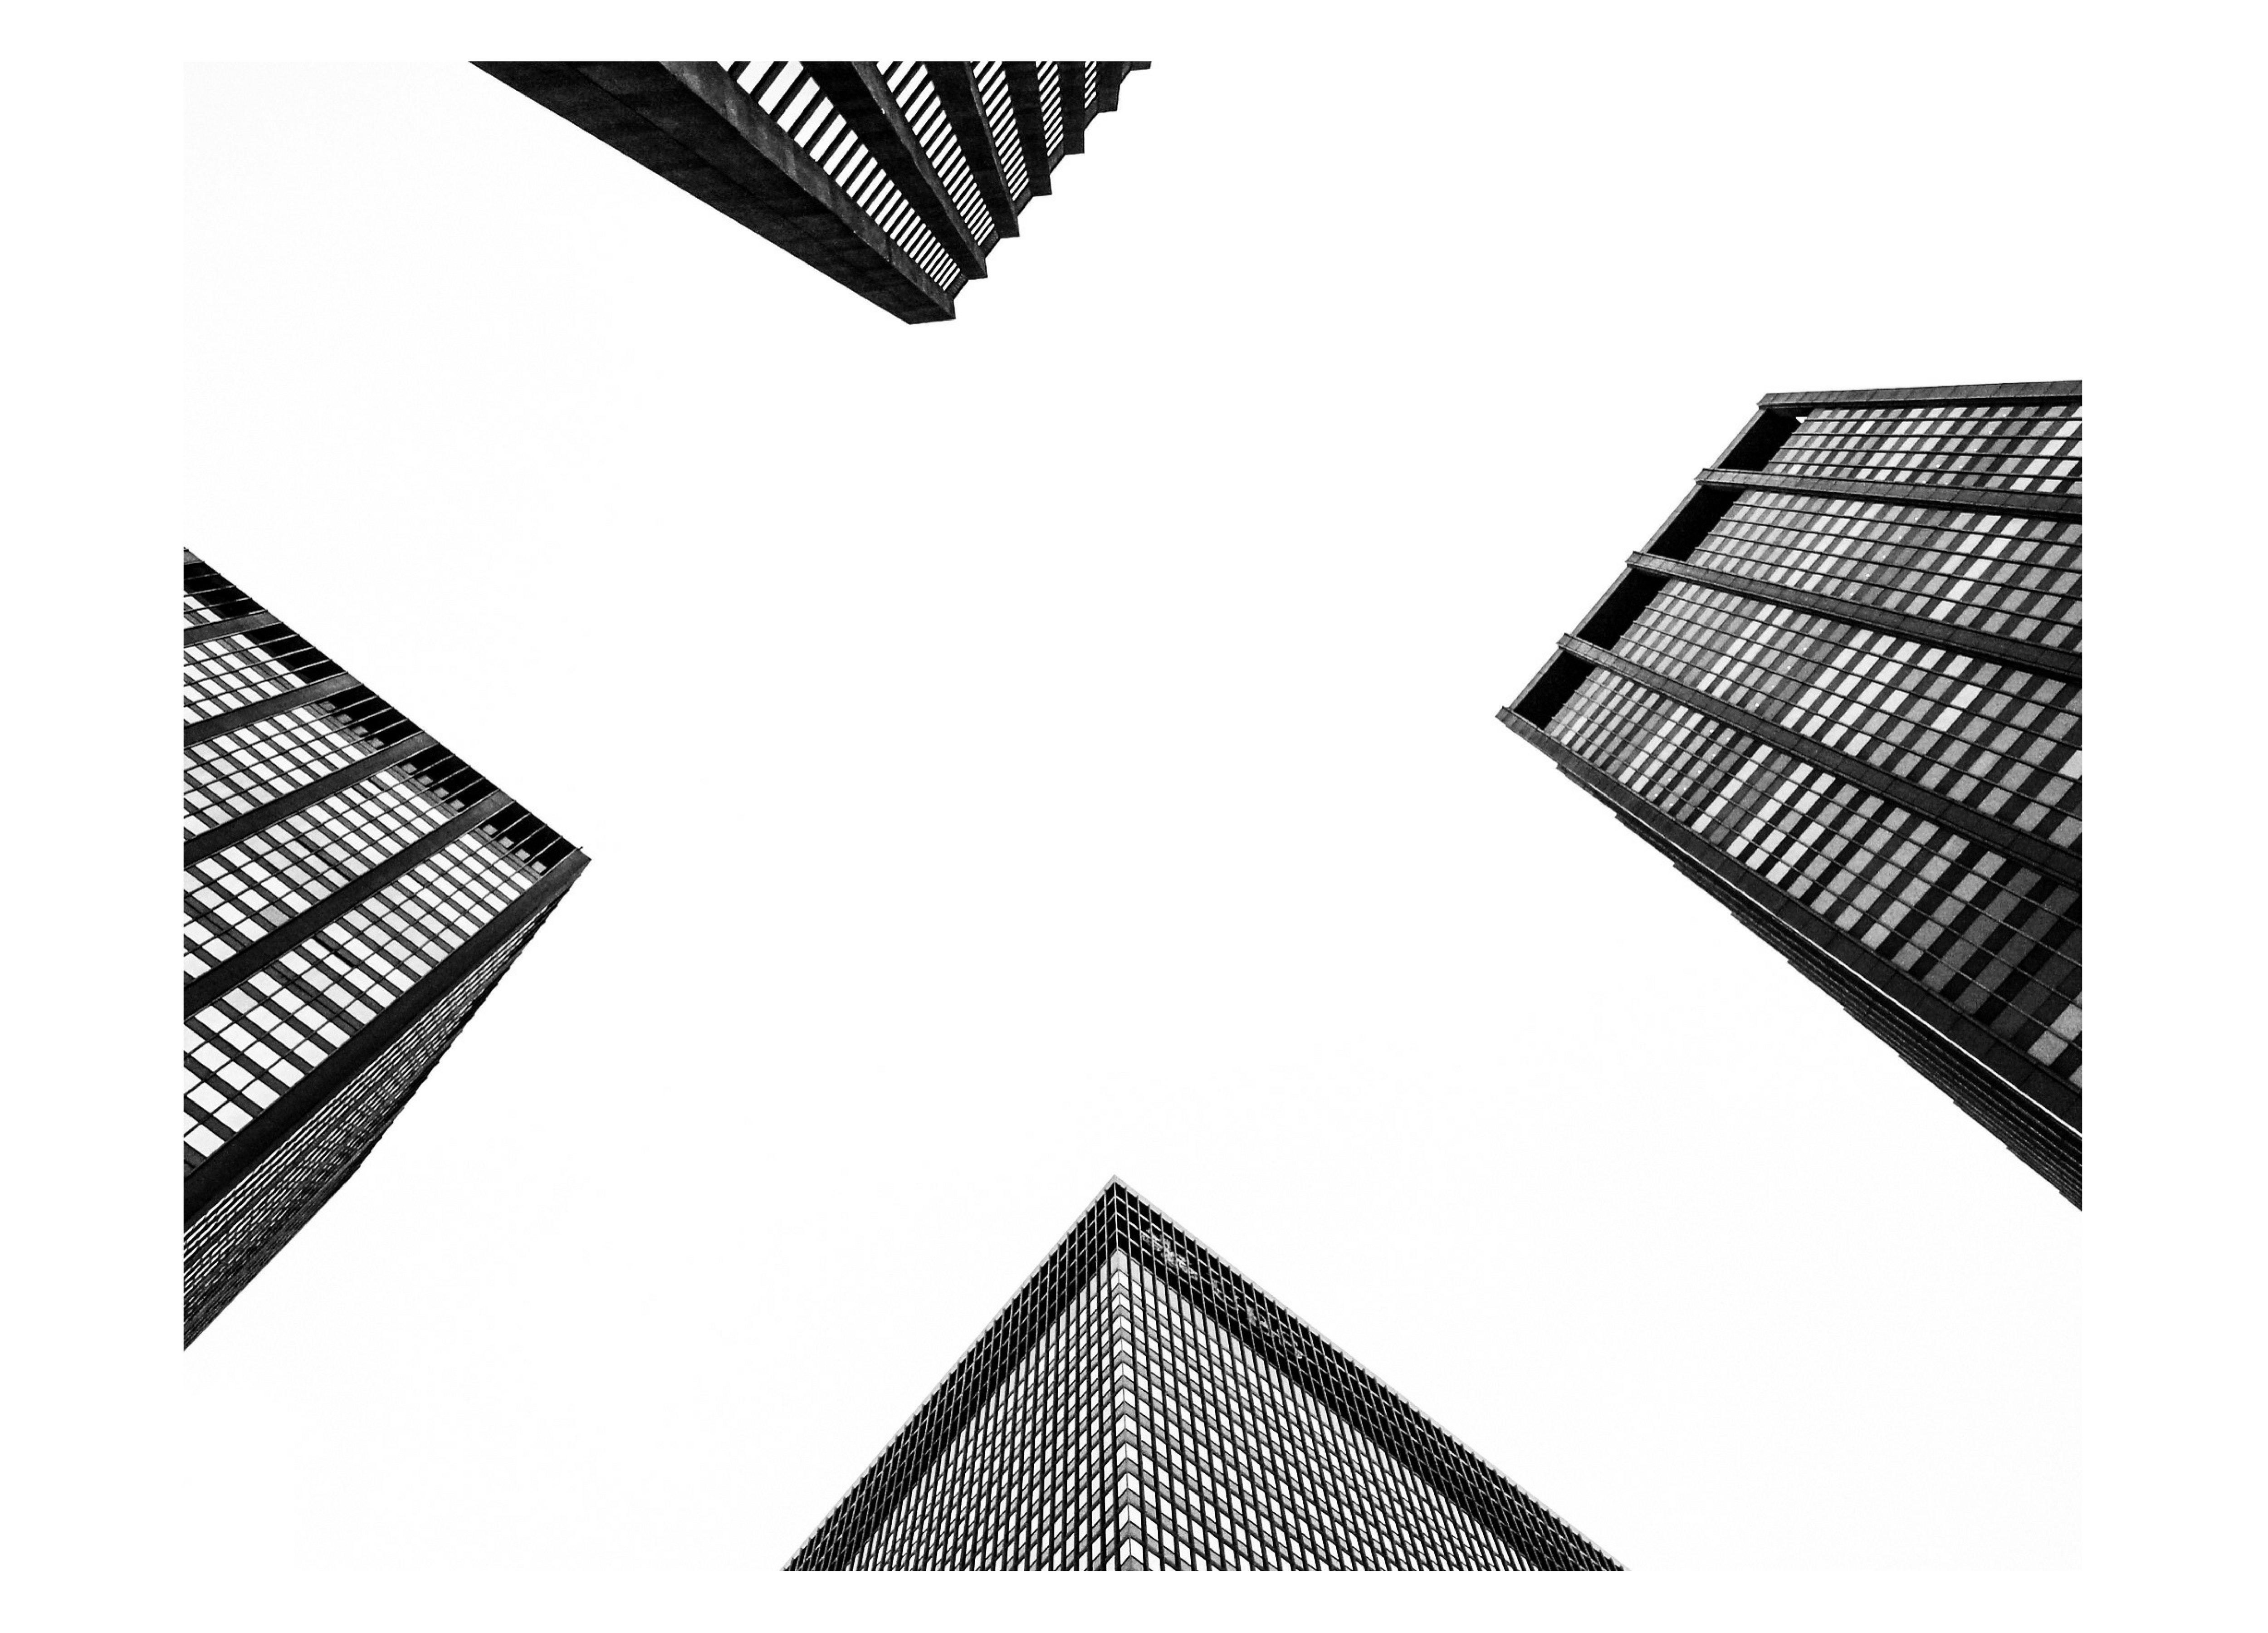 Line Art Photo Cs : Low angle photography of buildings · free stock photo